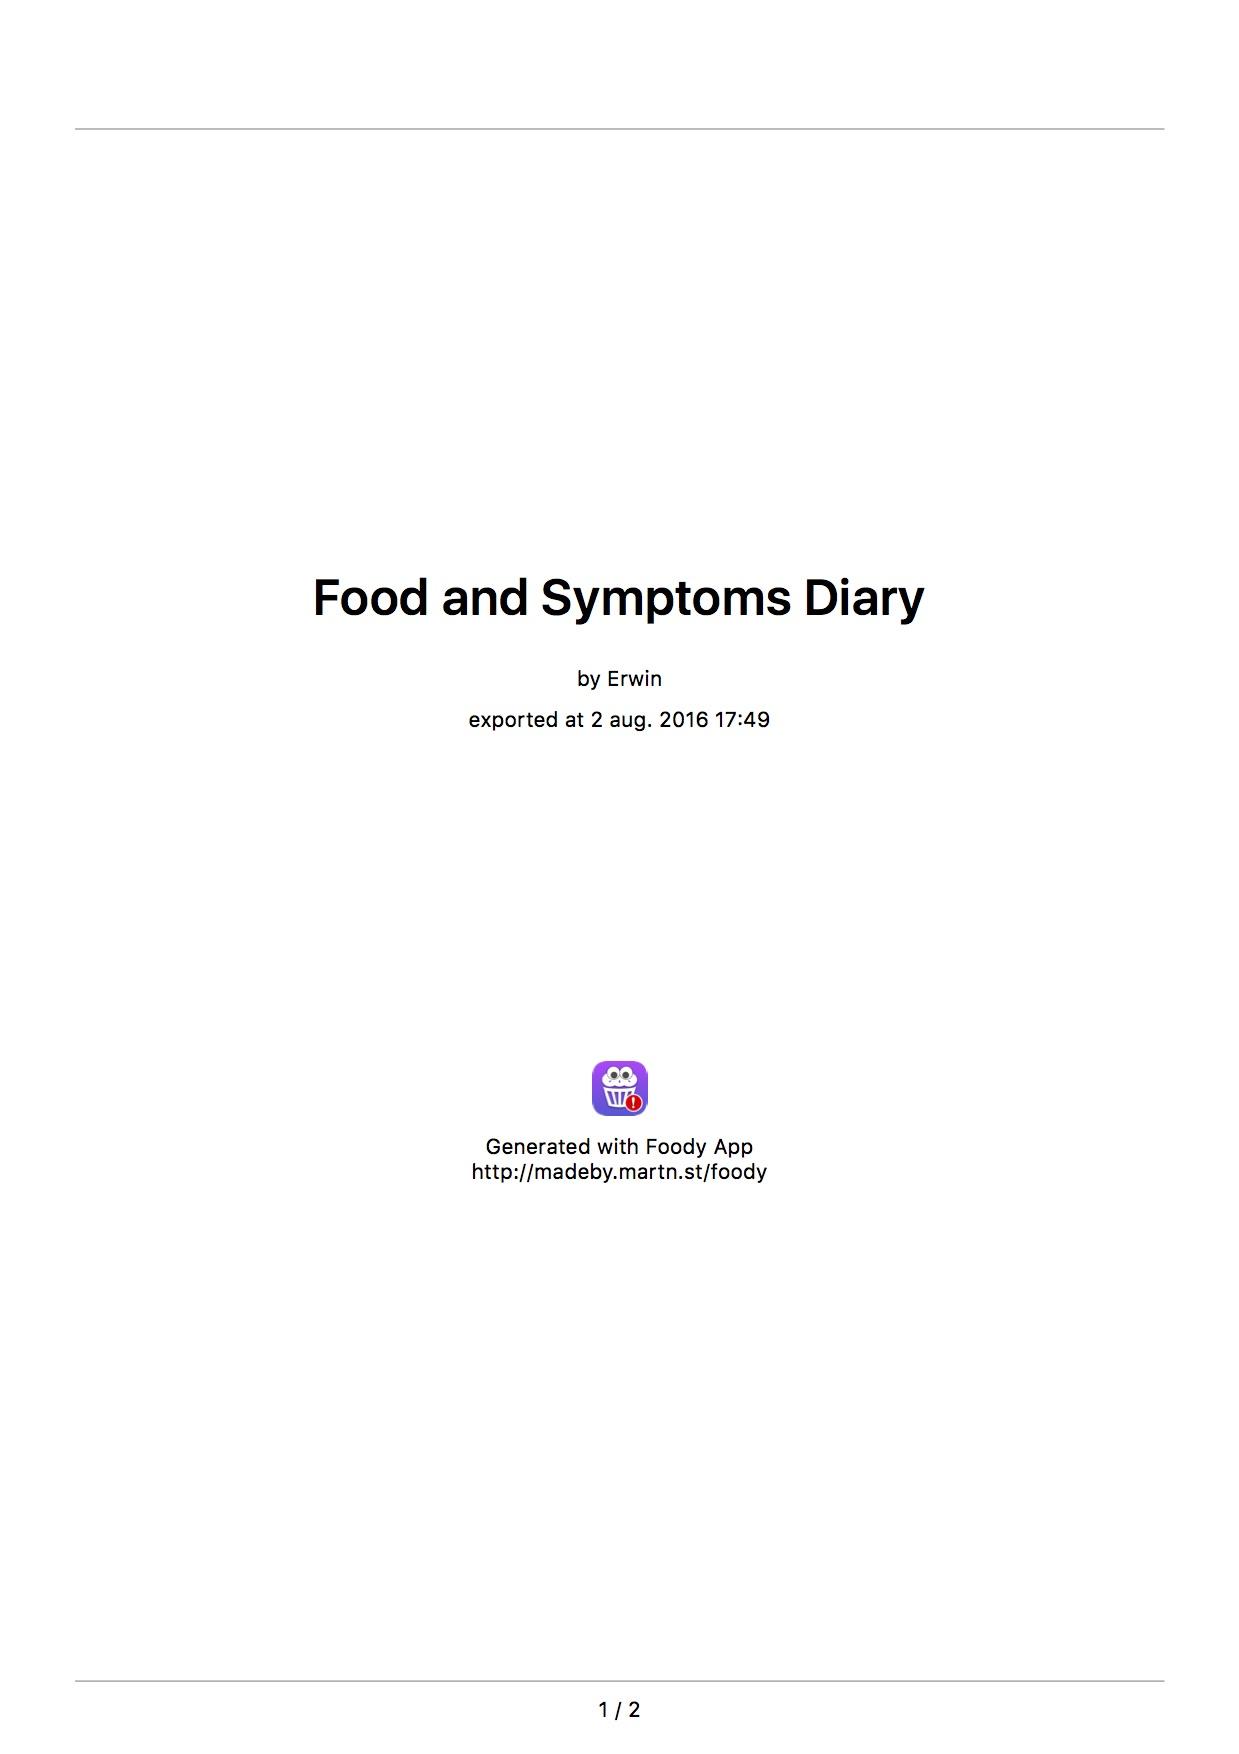 Foody Dagboek van Erwin